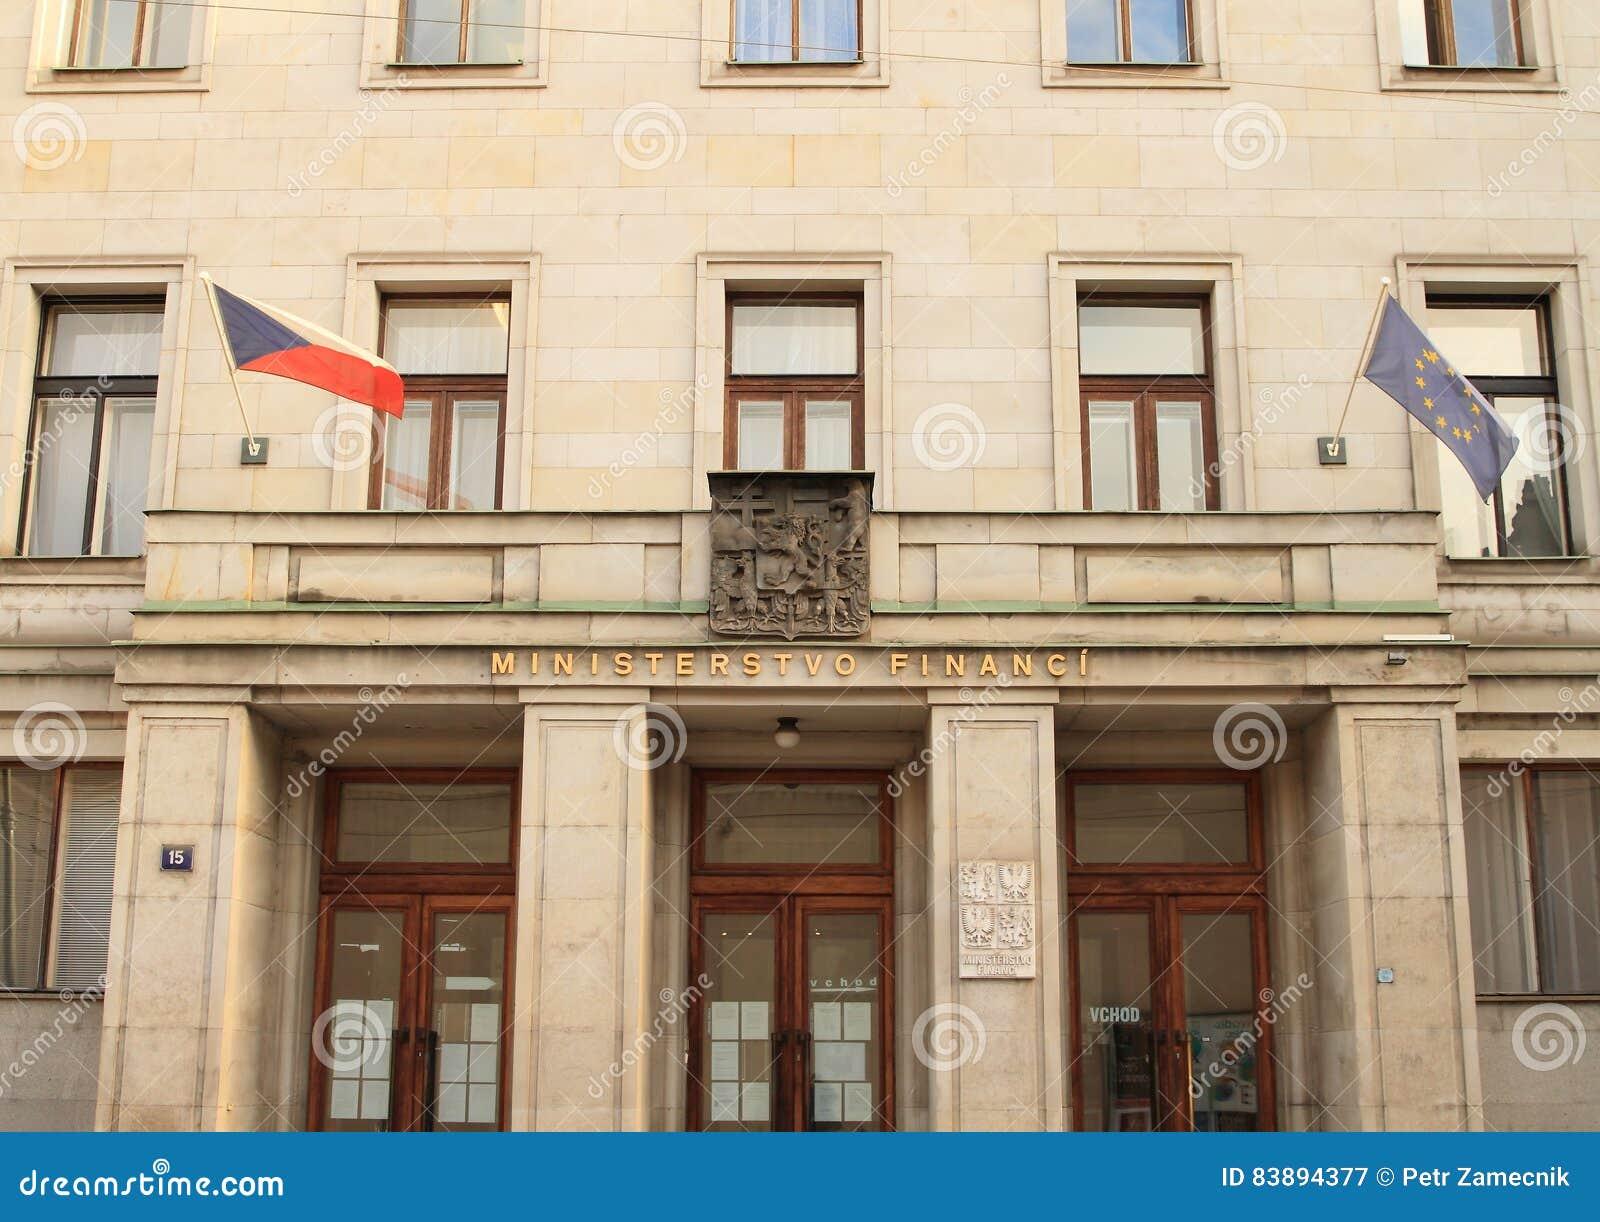 Ministry of Finance of Czech Republic